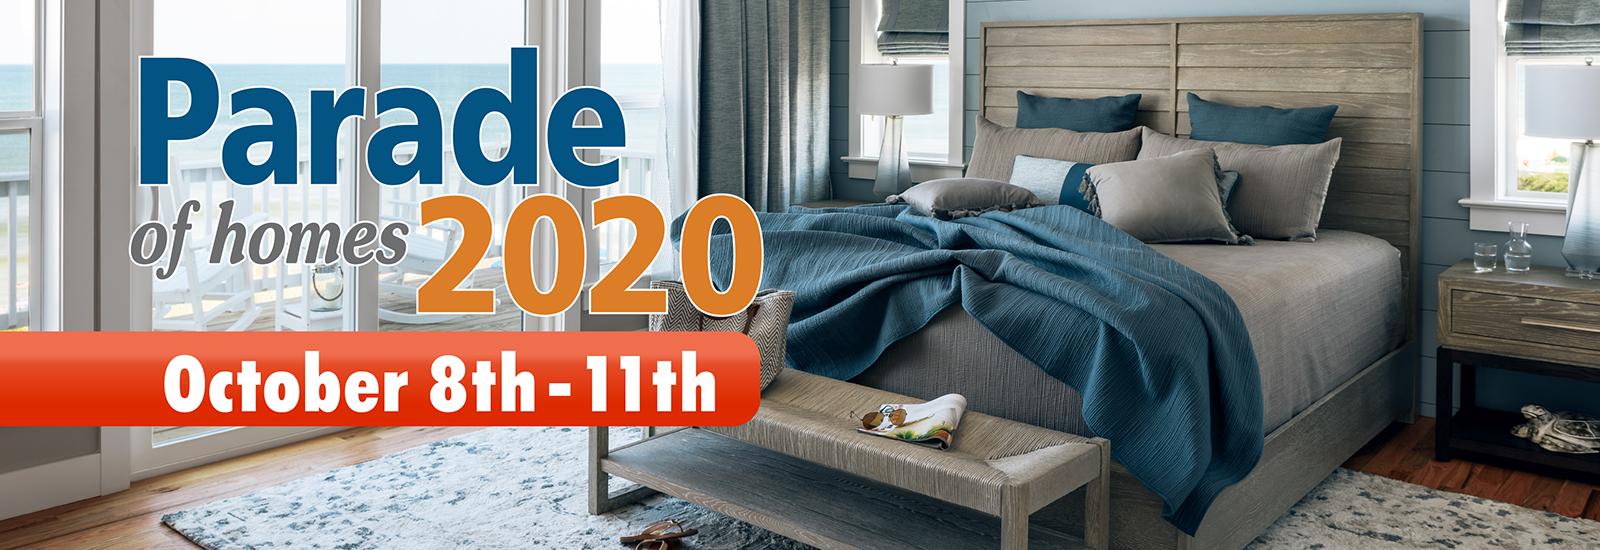 OBHB 2020 Parade Header Image FINAL